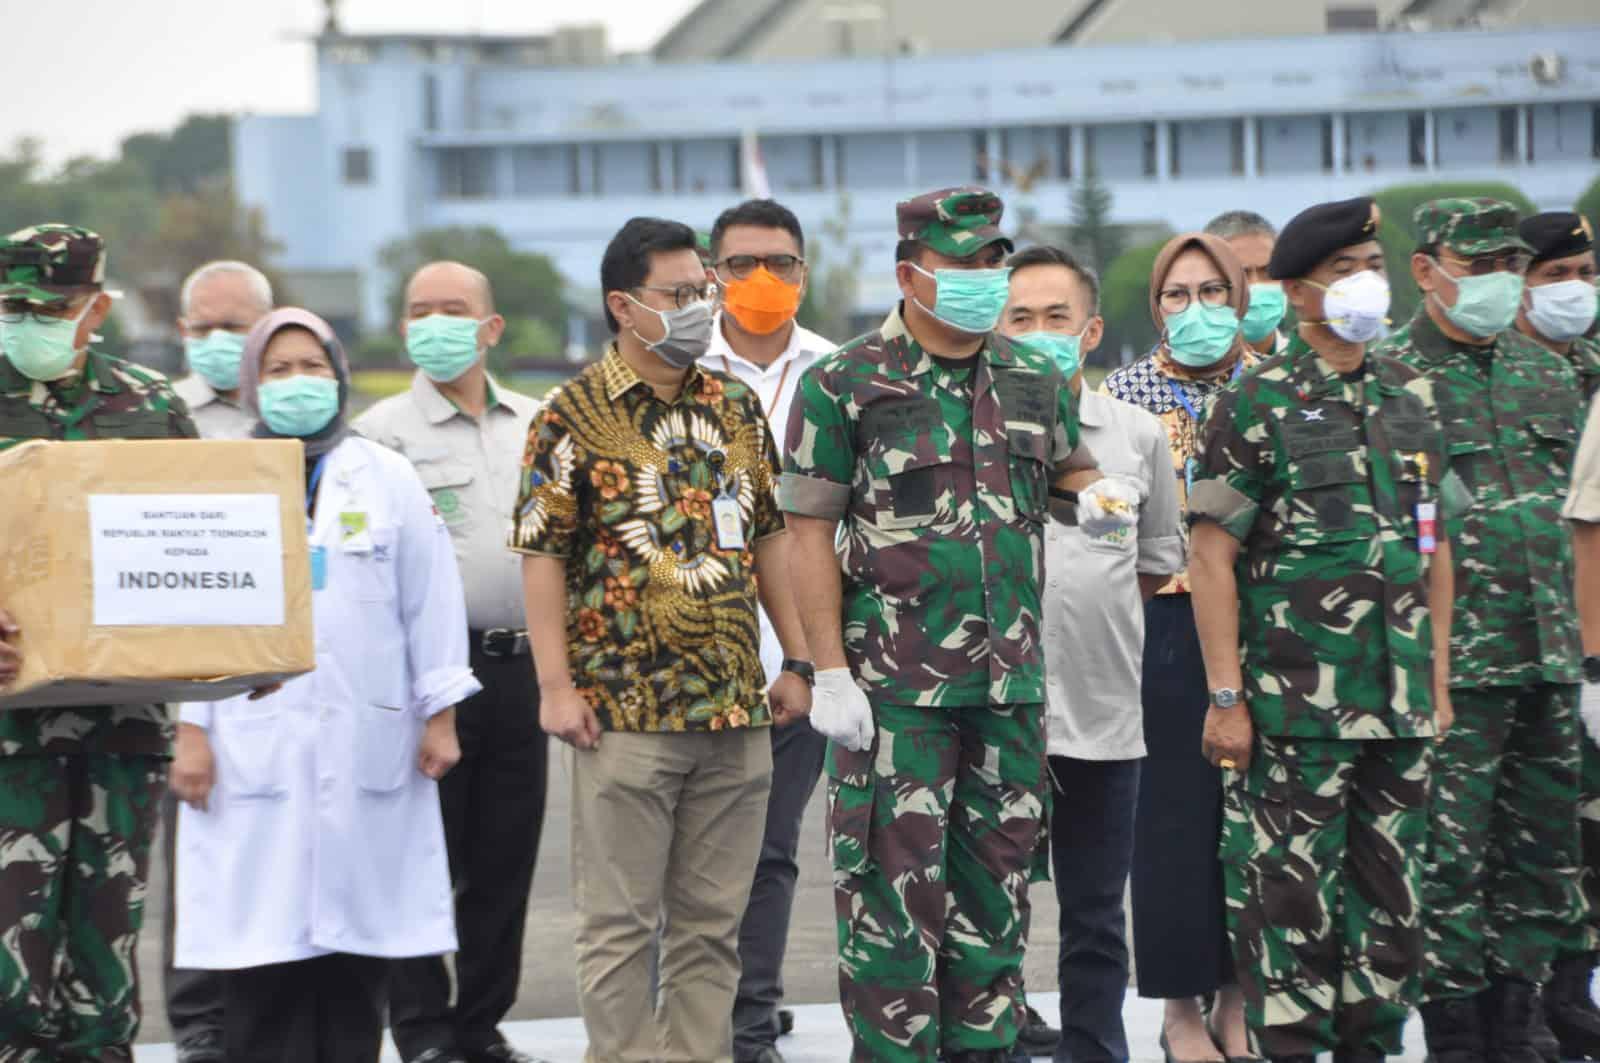 Koopsau I Gerak Cepat Bentuk Satuan Tugas PPC19, Alat Kesehatan diterima di Lanud HLM